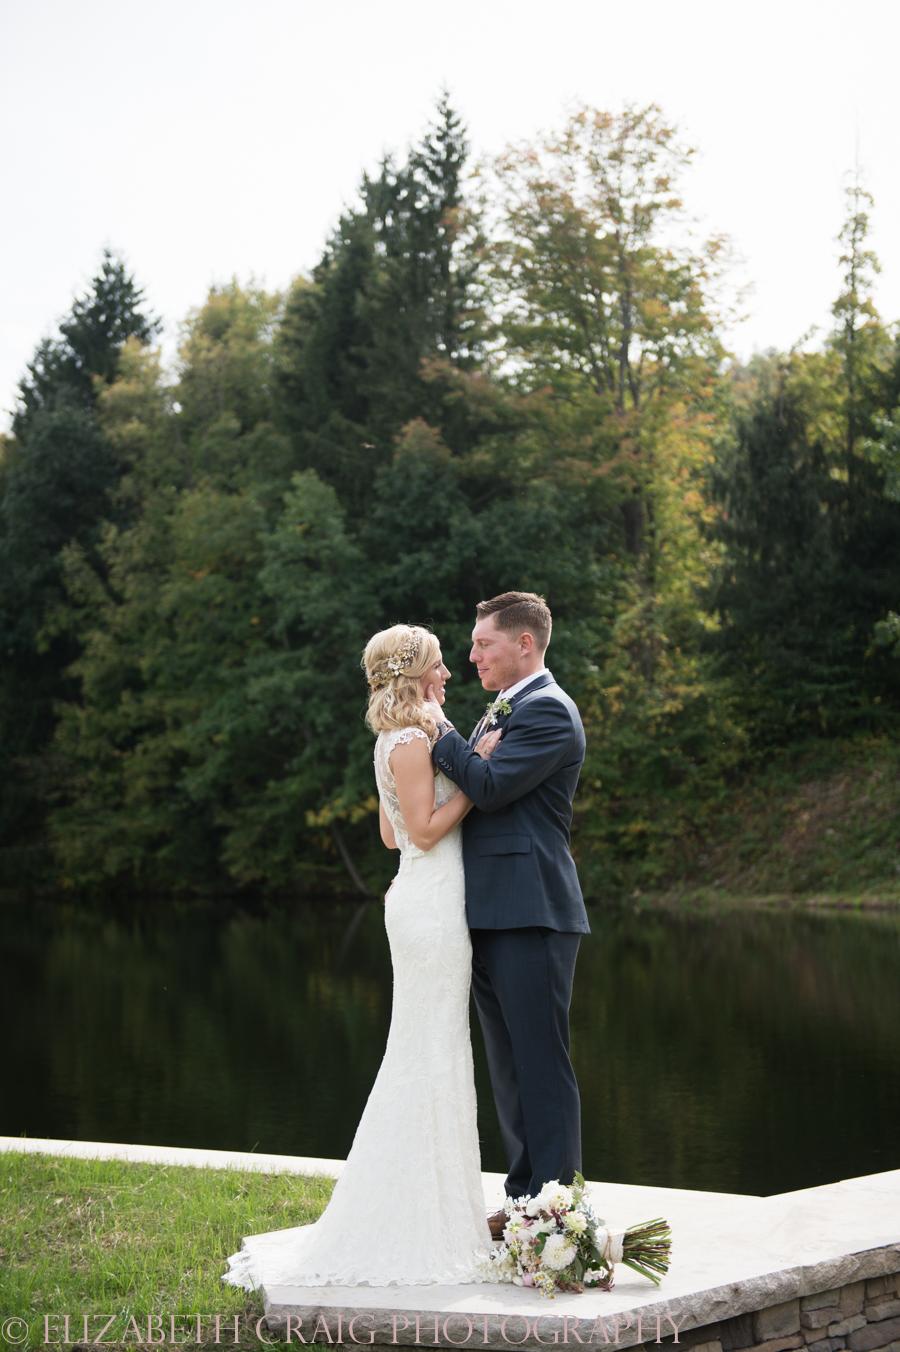 Dubois Brockway St. Marys PA Weddings-0121